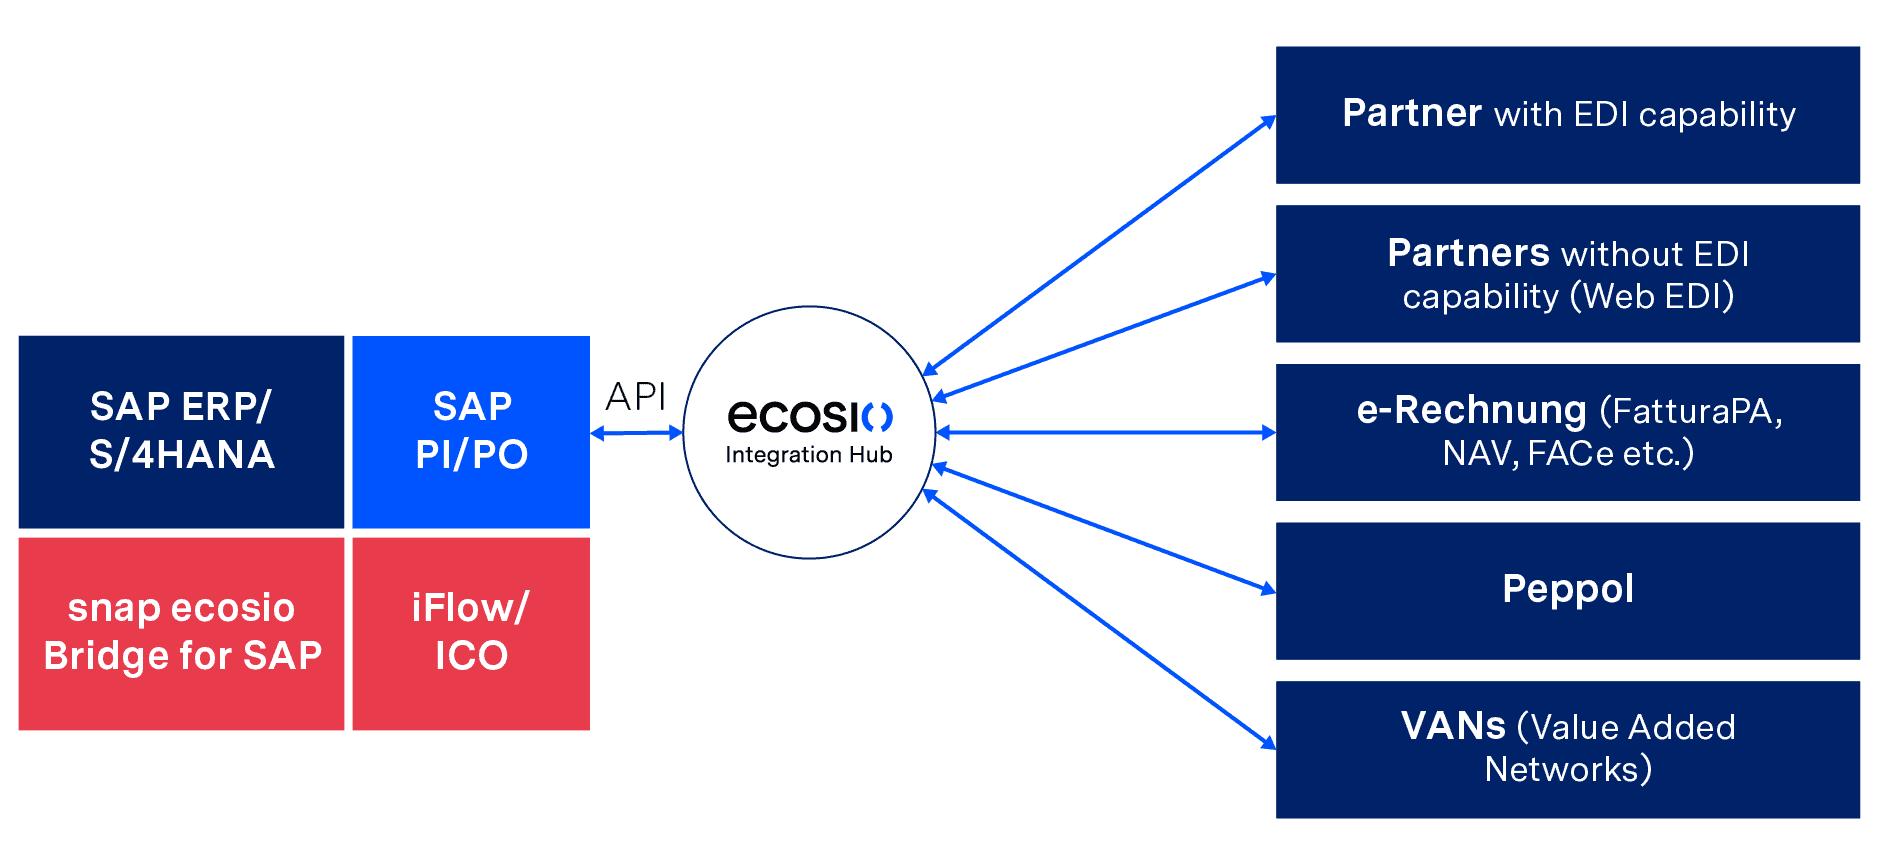 Tiefe EDI-Integration in SAP mit snap ecosio Bridge for SAP und iFlow/ICO